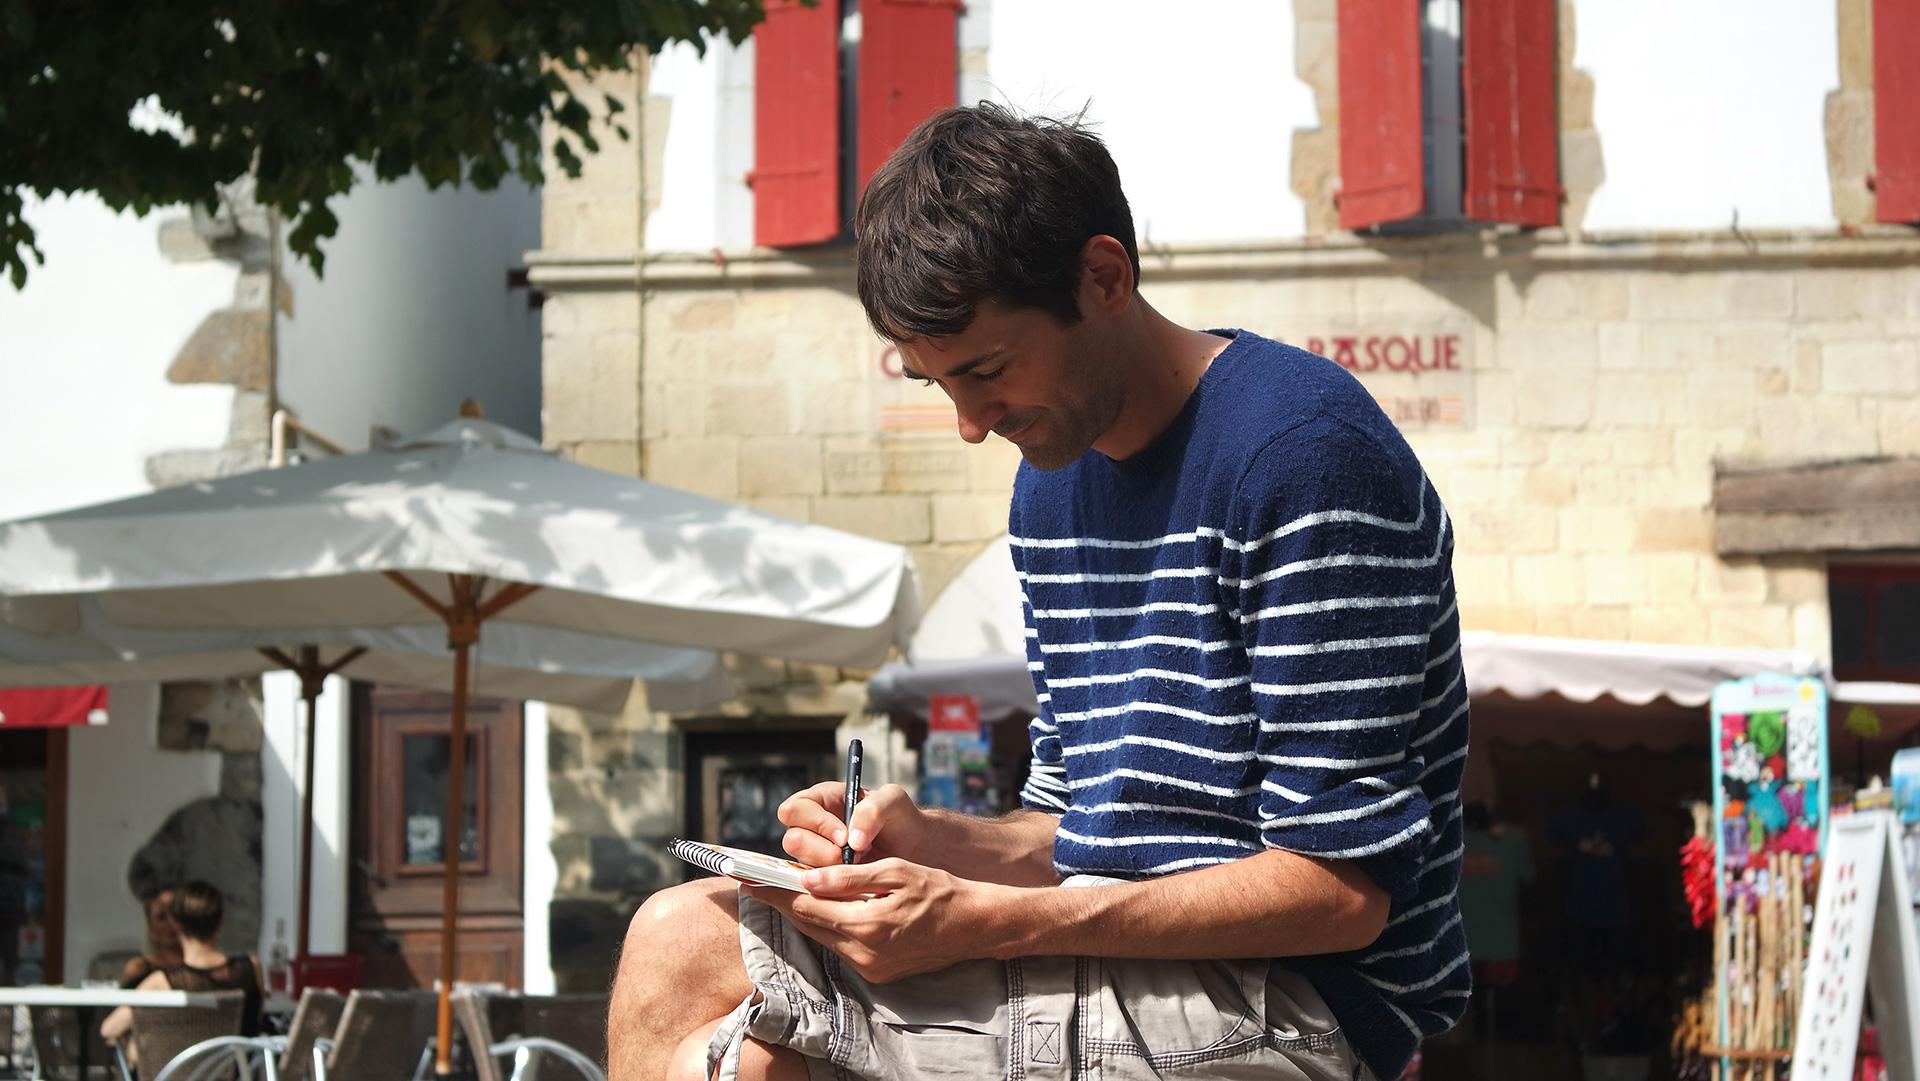 Olivier sketching in Espelette